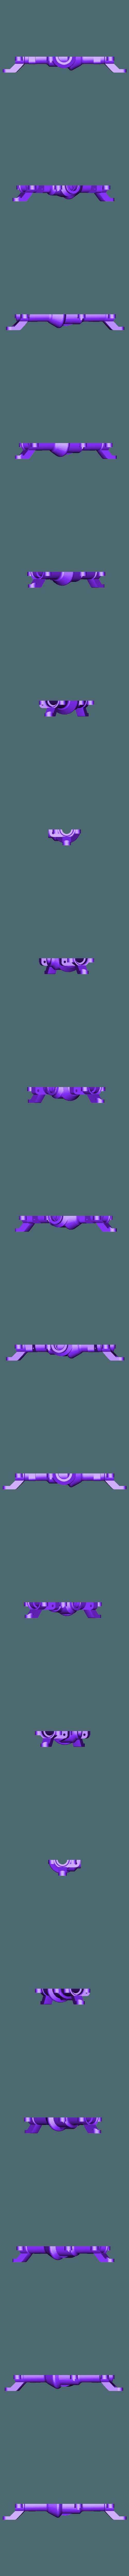 Truck_V4_Axle_Front_Single_Bottom.STL Download STL file 3D Printed Rc Truck V4 • 3D printable template, MrCrankyface